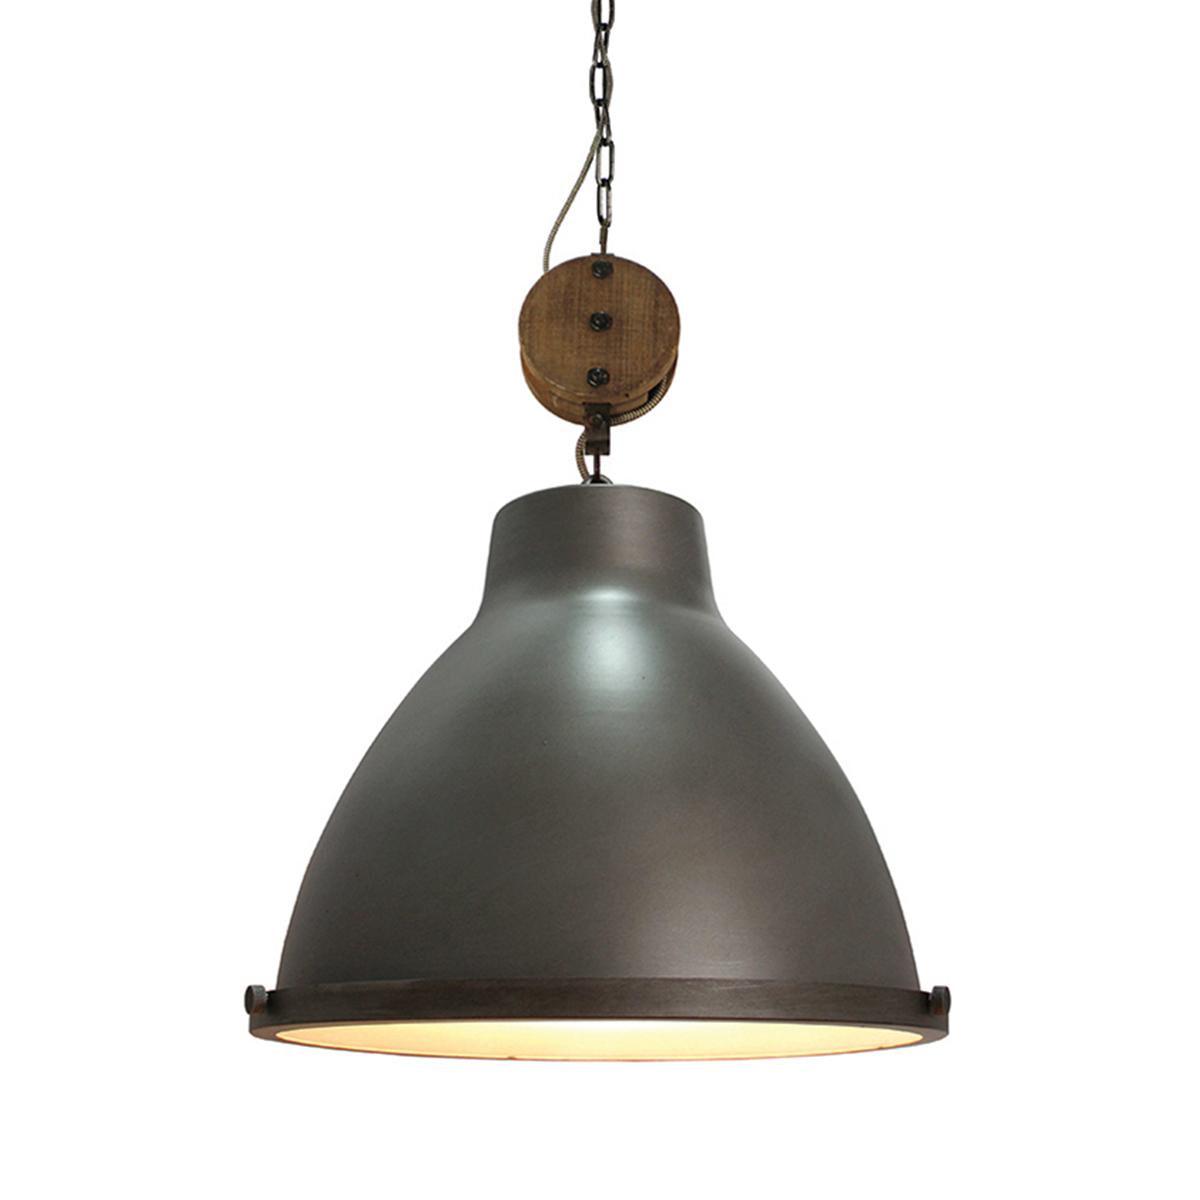 LABEL51 hanglamp 'Dock' 42x42x37 cm